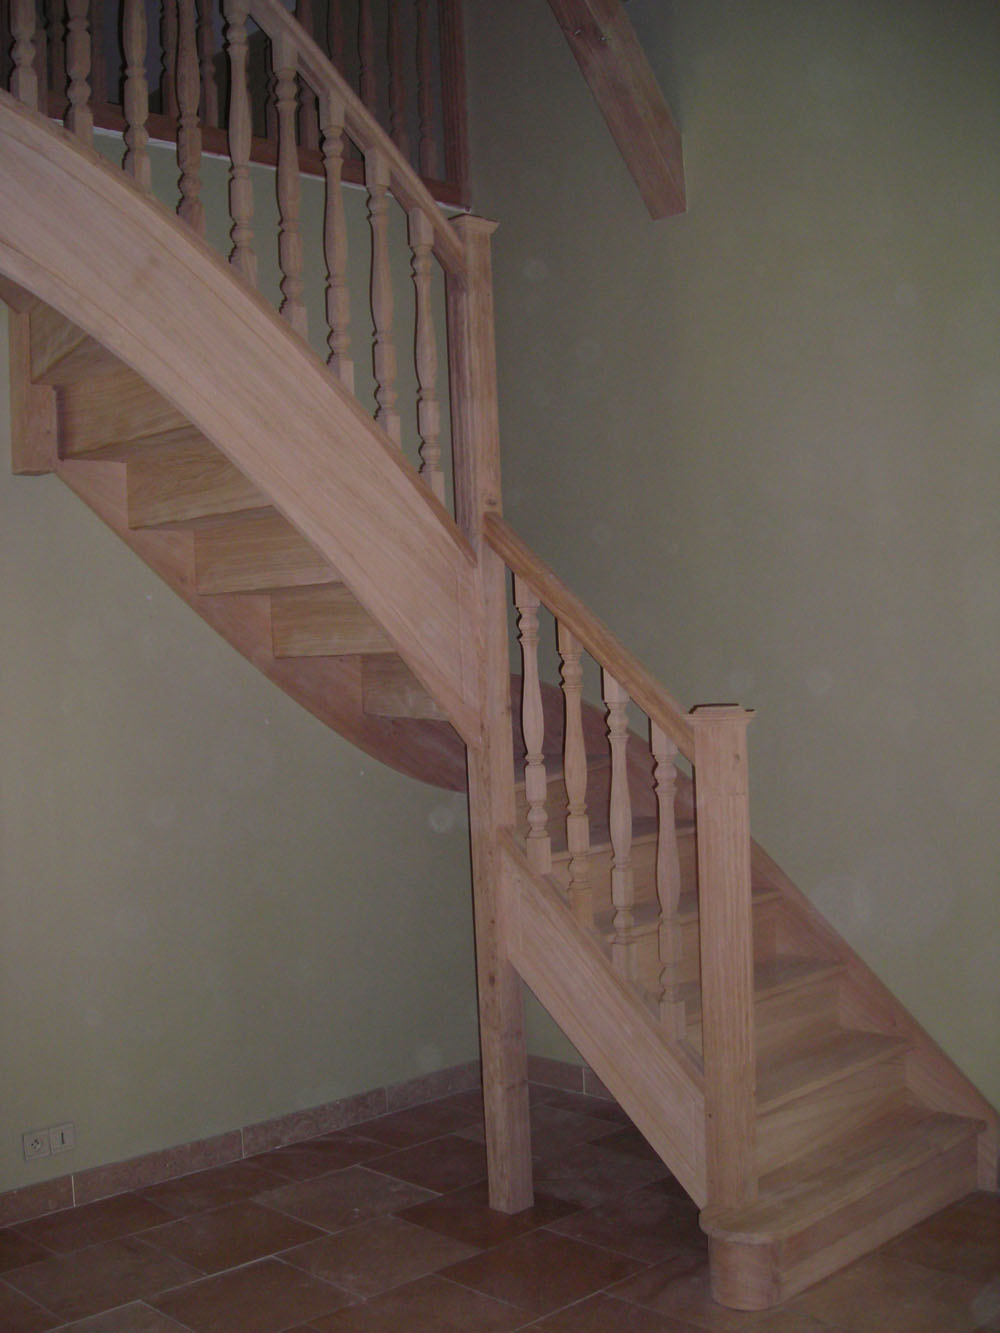 balustre bois escalier escalier chne avec balustres bois. Black Bedroom Furniture Sets. Home Design Ideas